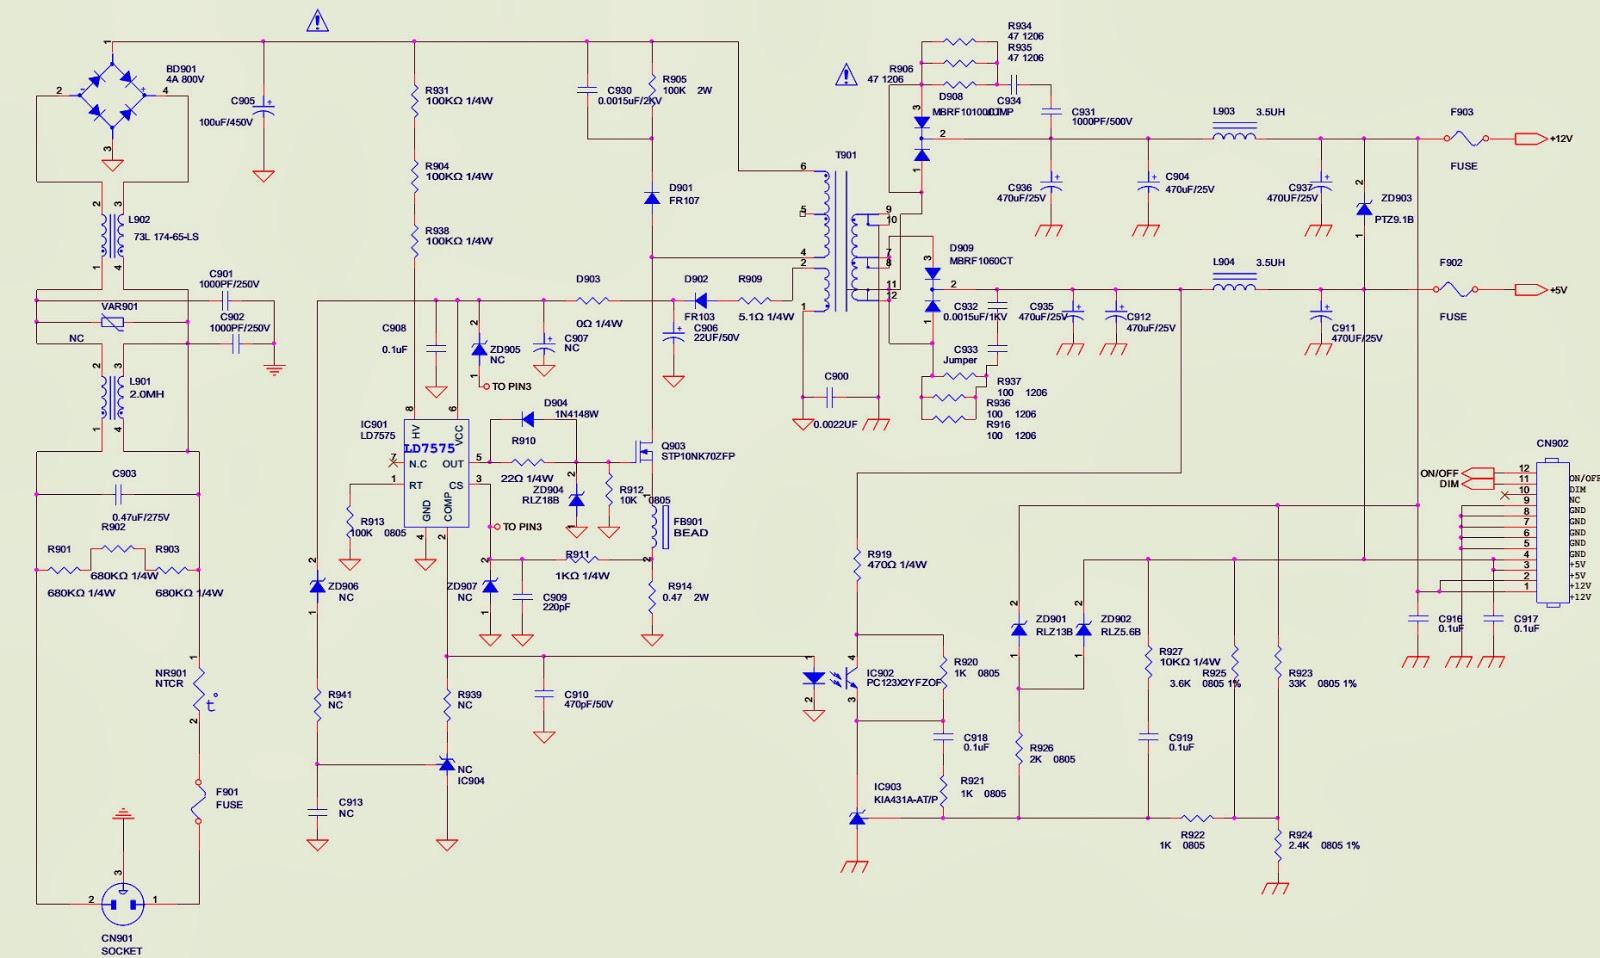 hcl hcm9lwat11 19 inch lcd monitor power supply schematic aoc lcd monitor schematic diagram lcd monitor schematic diagram [ 1600 x 958 Pixel ]